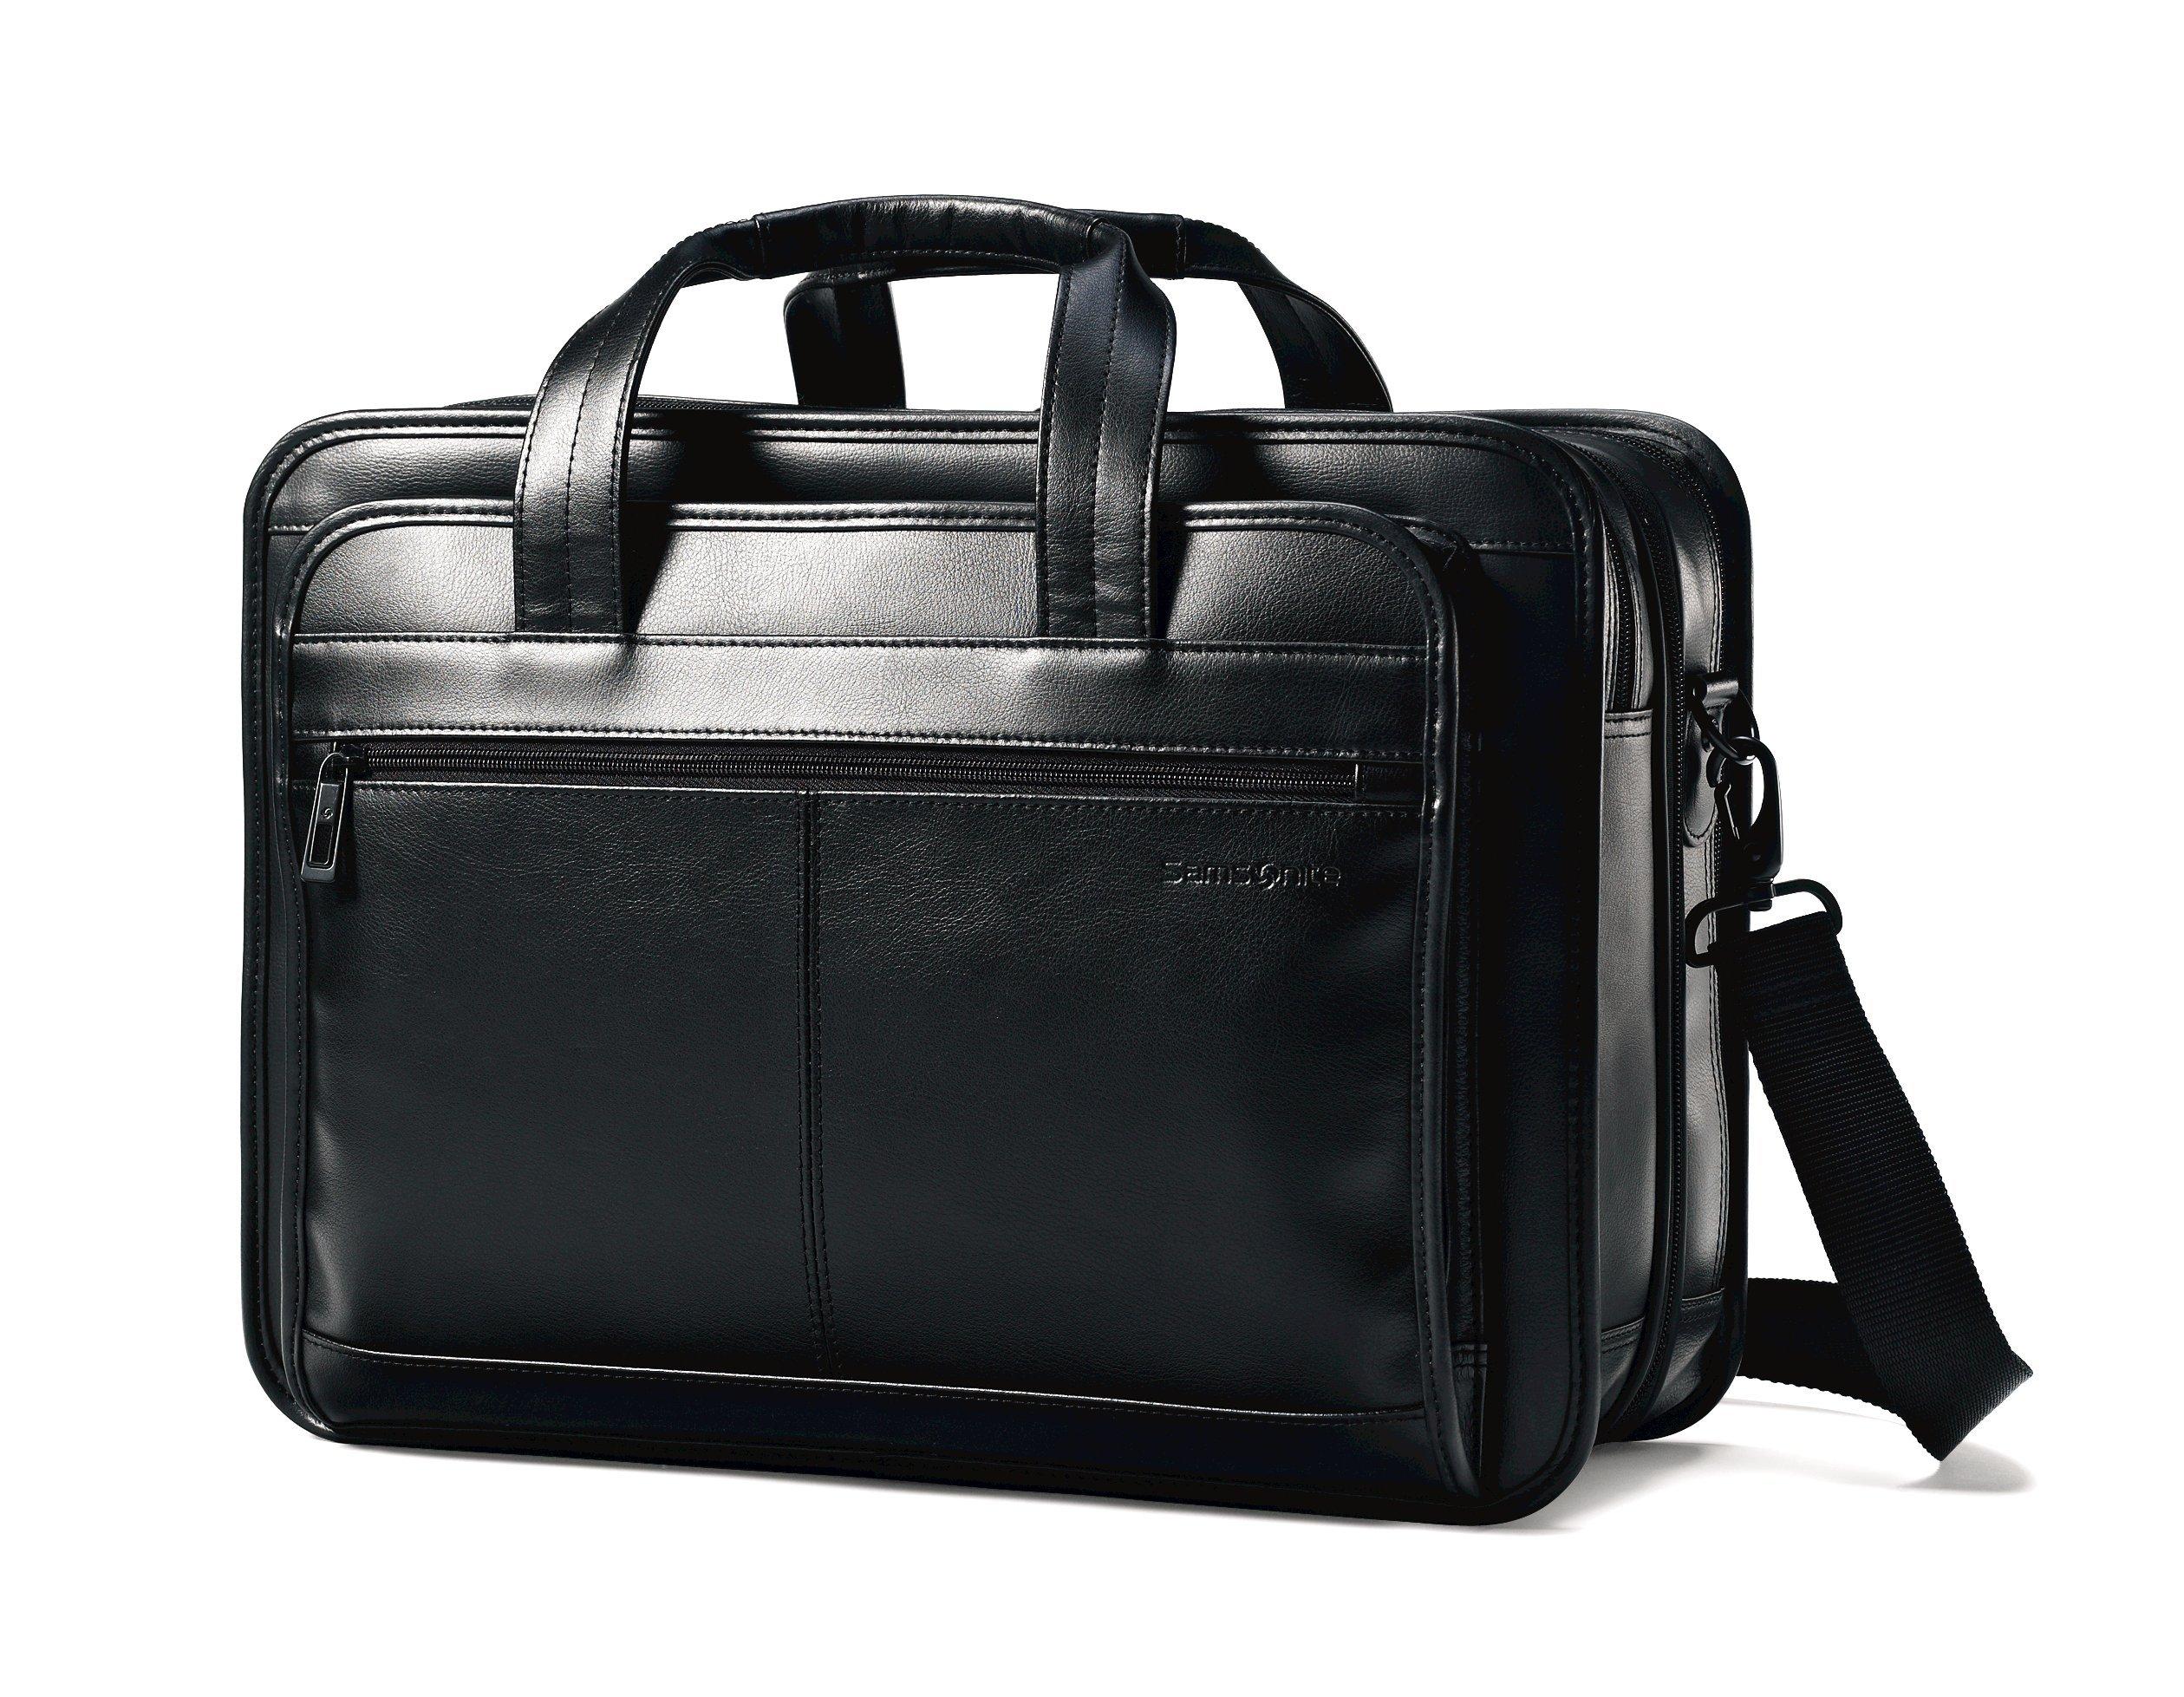 Samsonite Leather Expandable Briefcase, Black by Samsonite